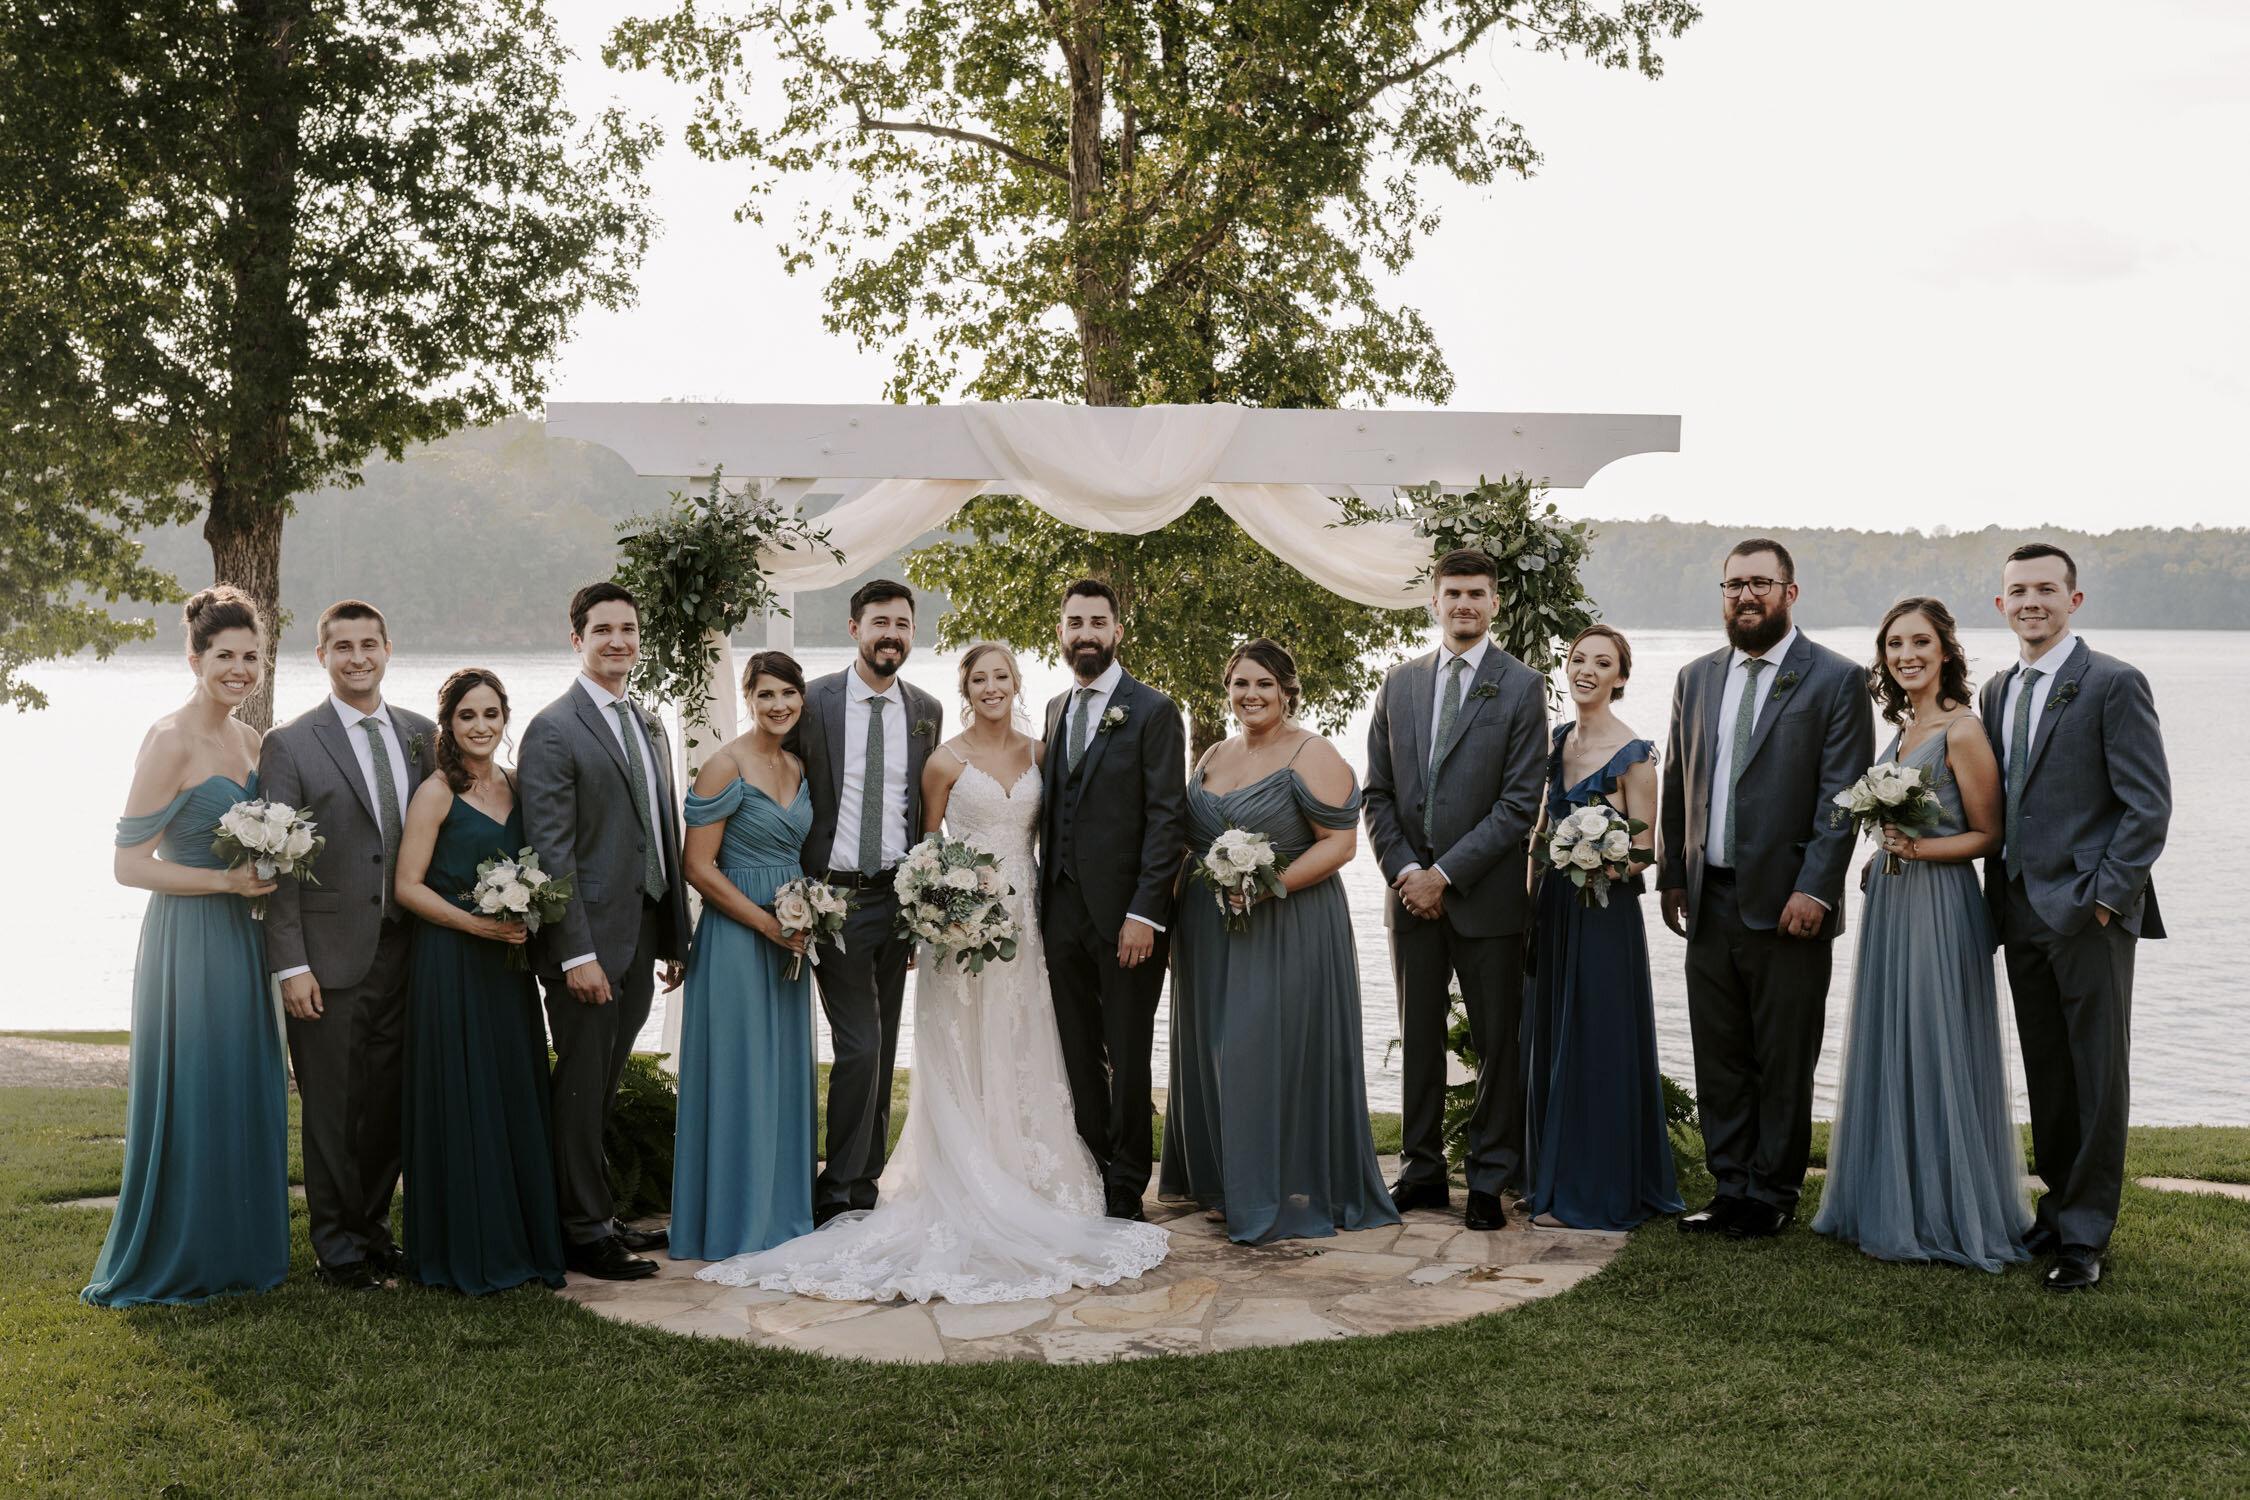 Wedding party portraits at Bella Collina   Bridesmaids and Groomsmen   By Greensboro, NC Wedding Photographer: Kayli LaFon Photography